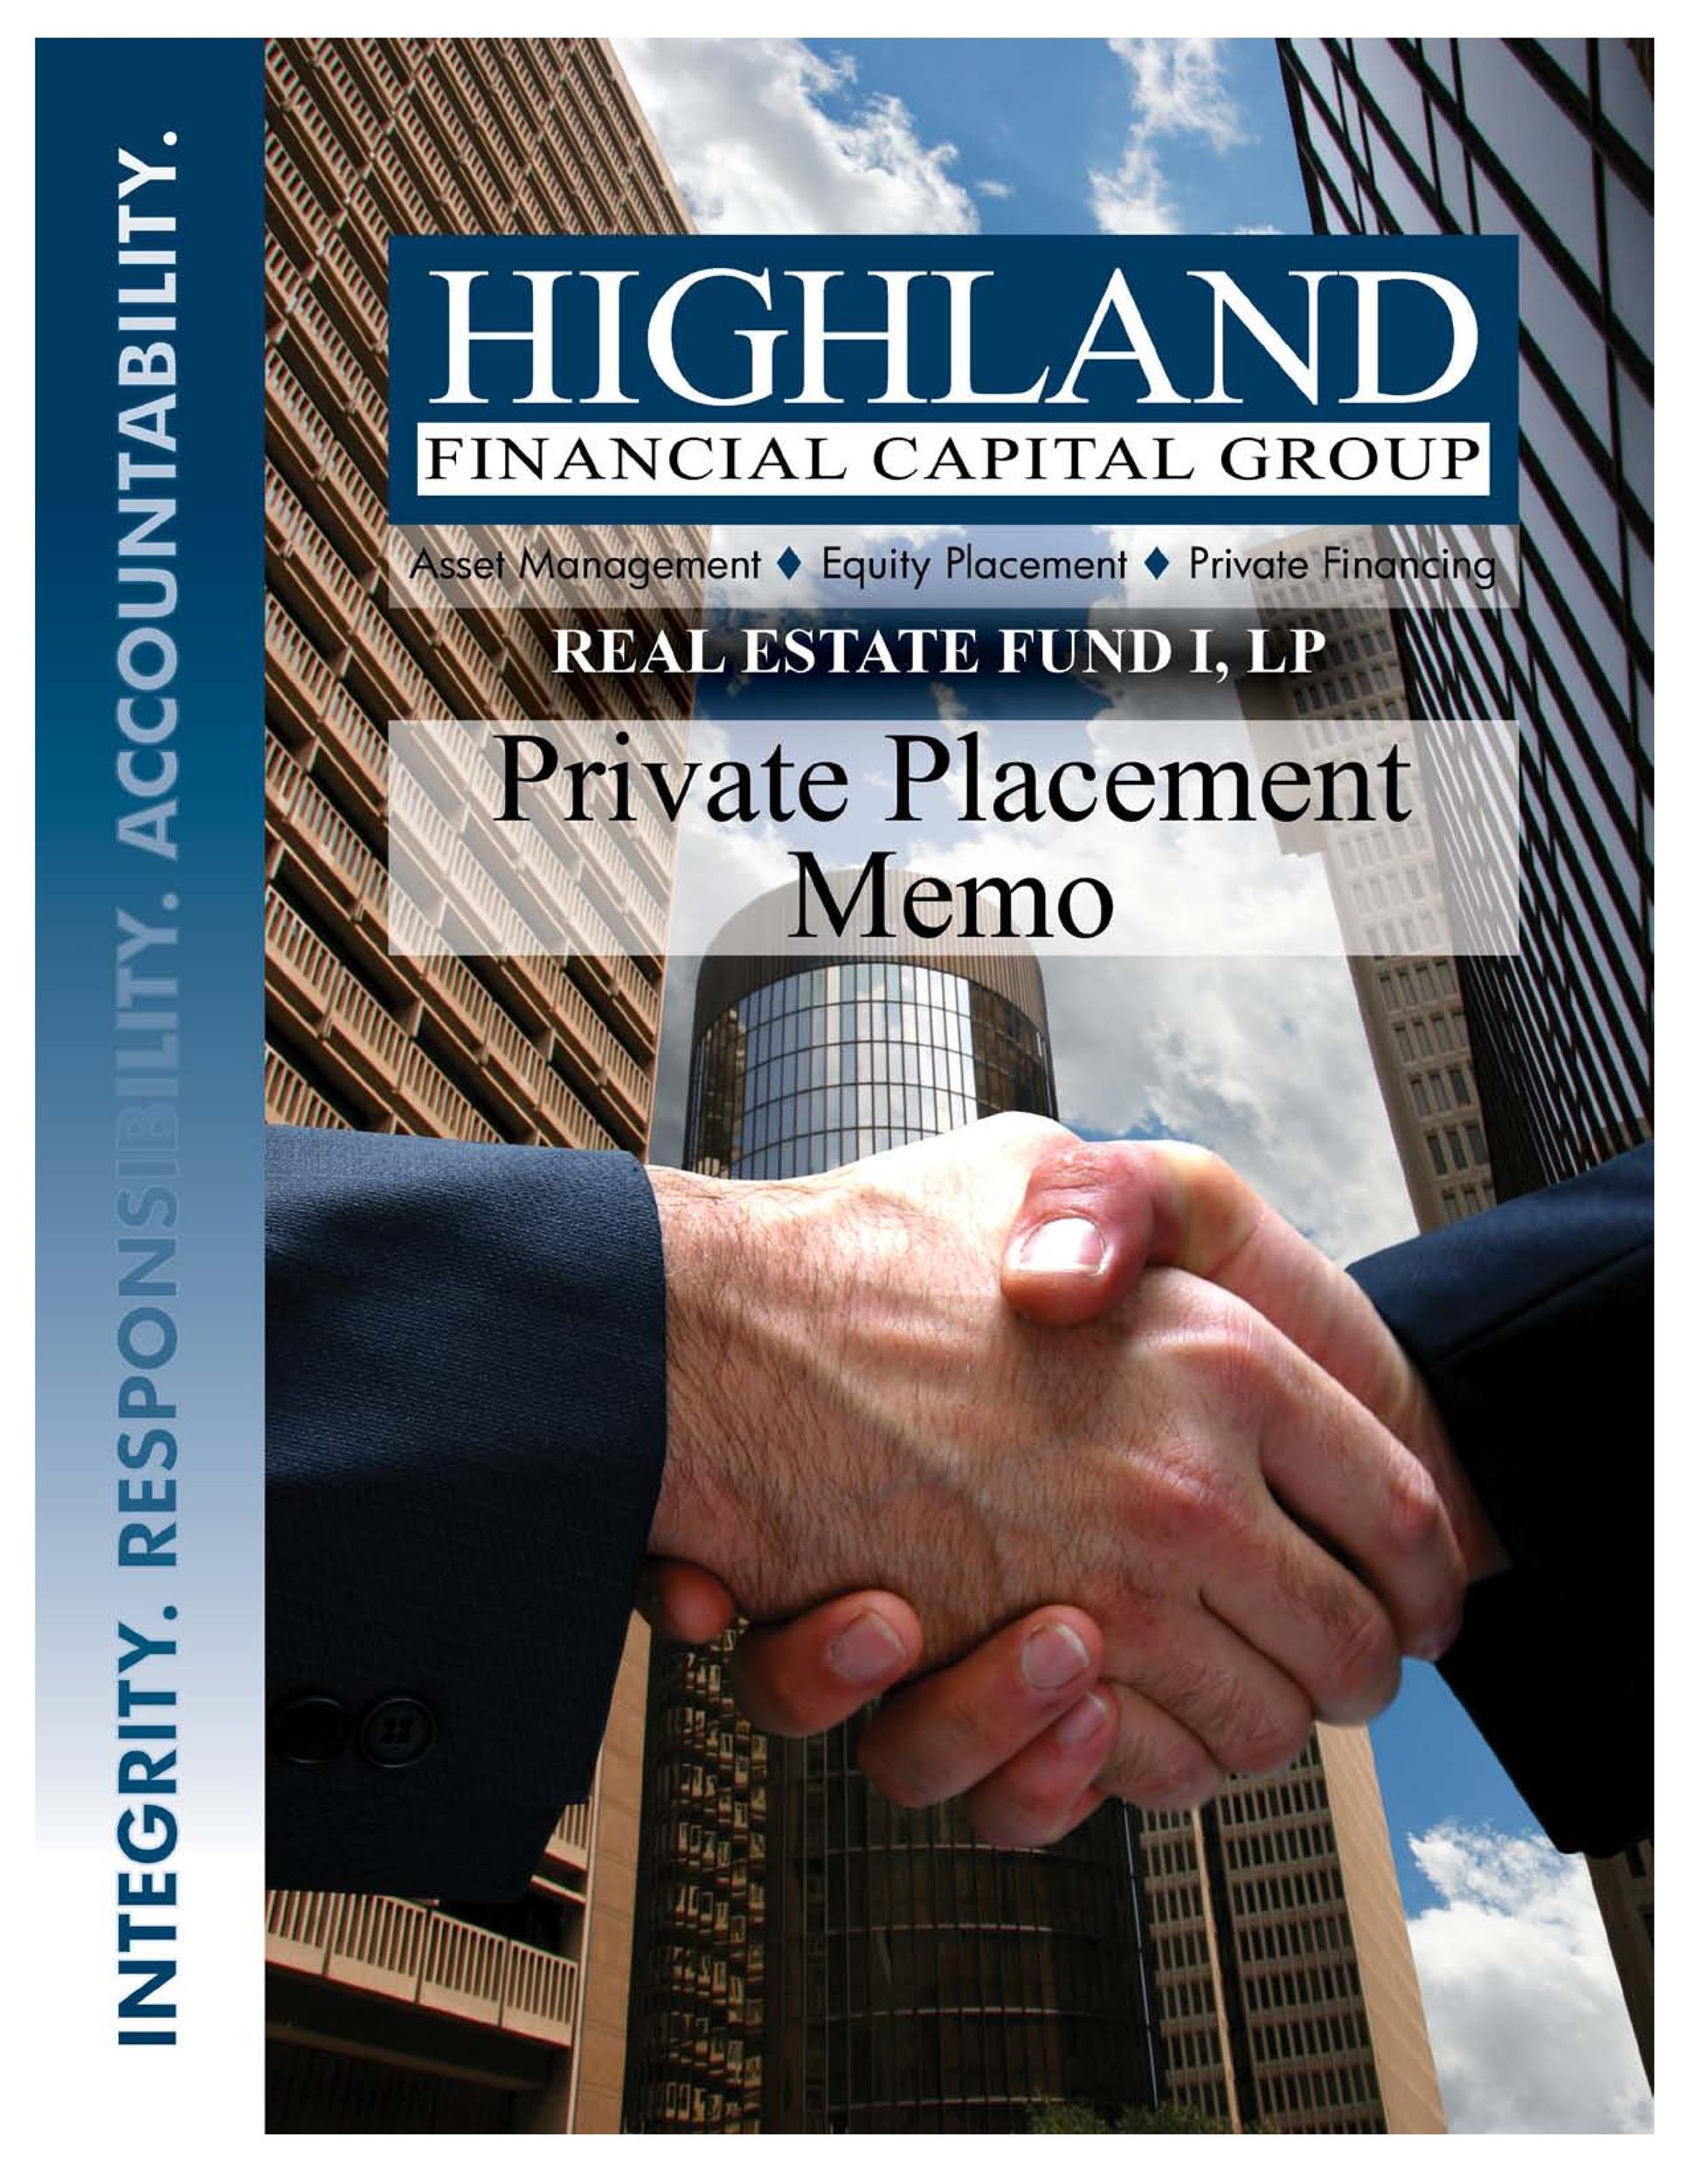 40 Private Placement Memorandum Templates [Word, PDF]